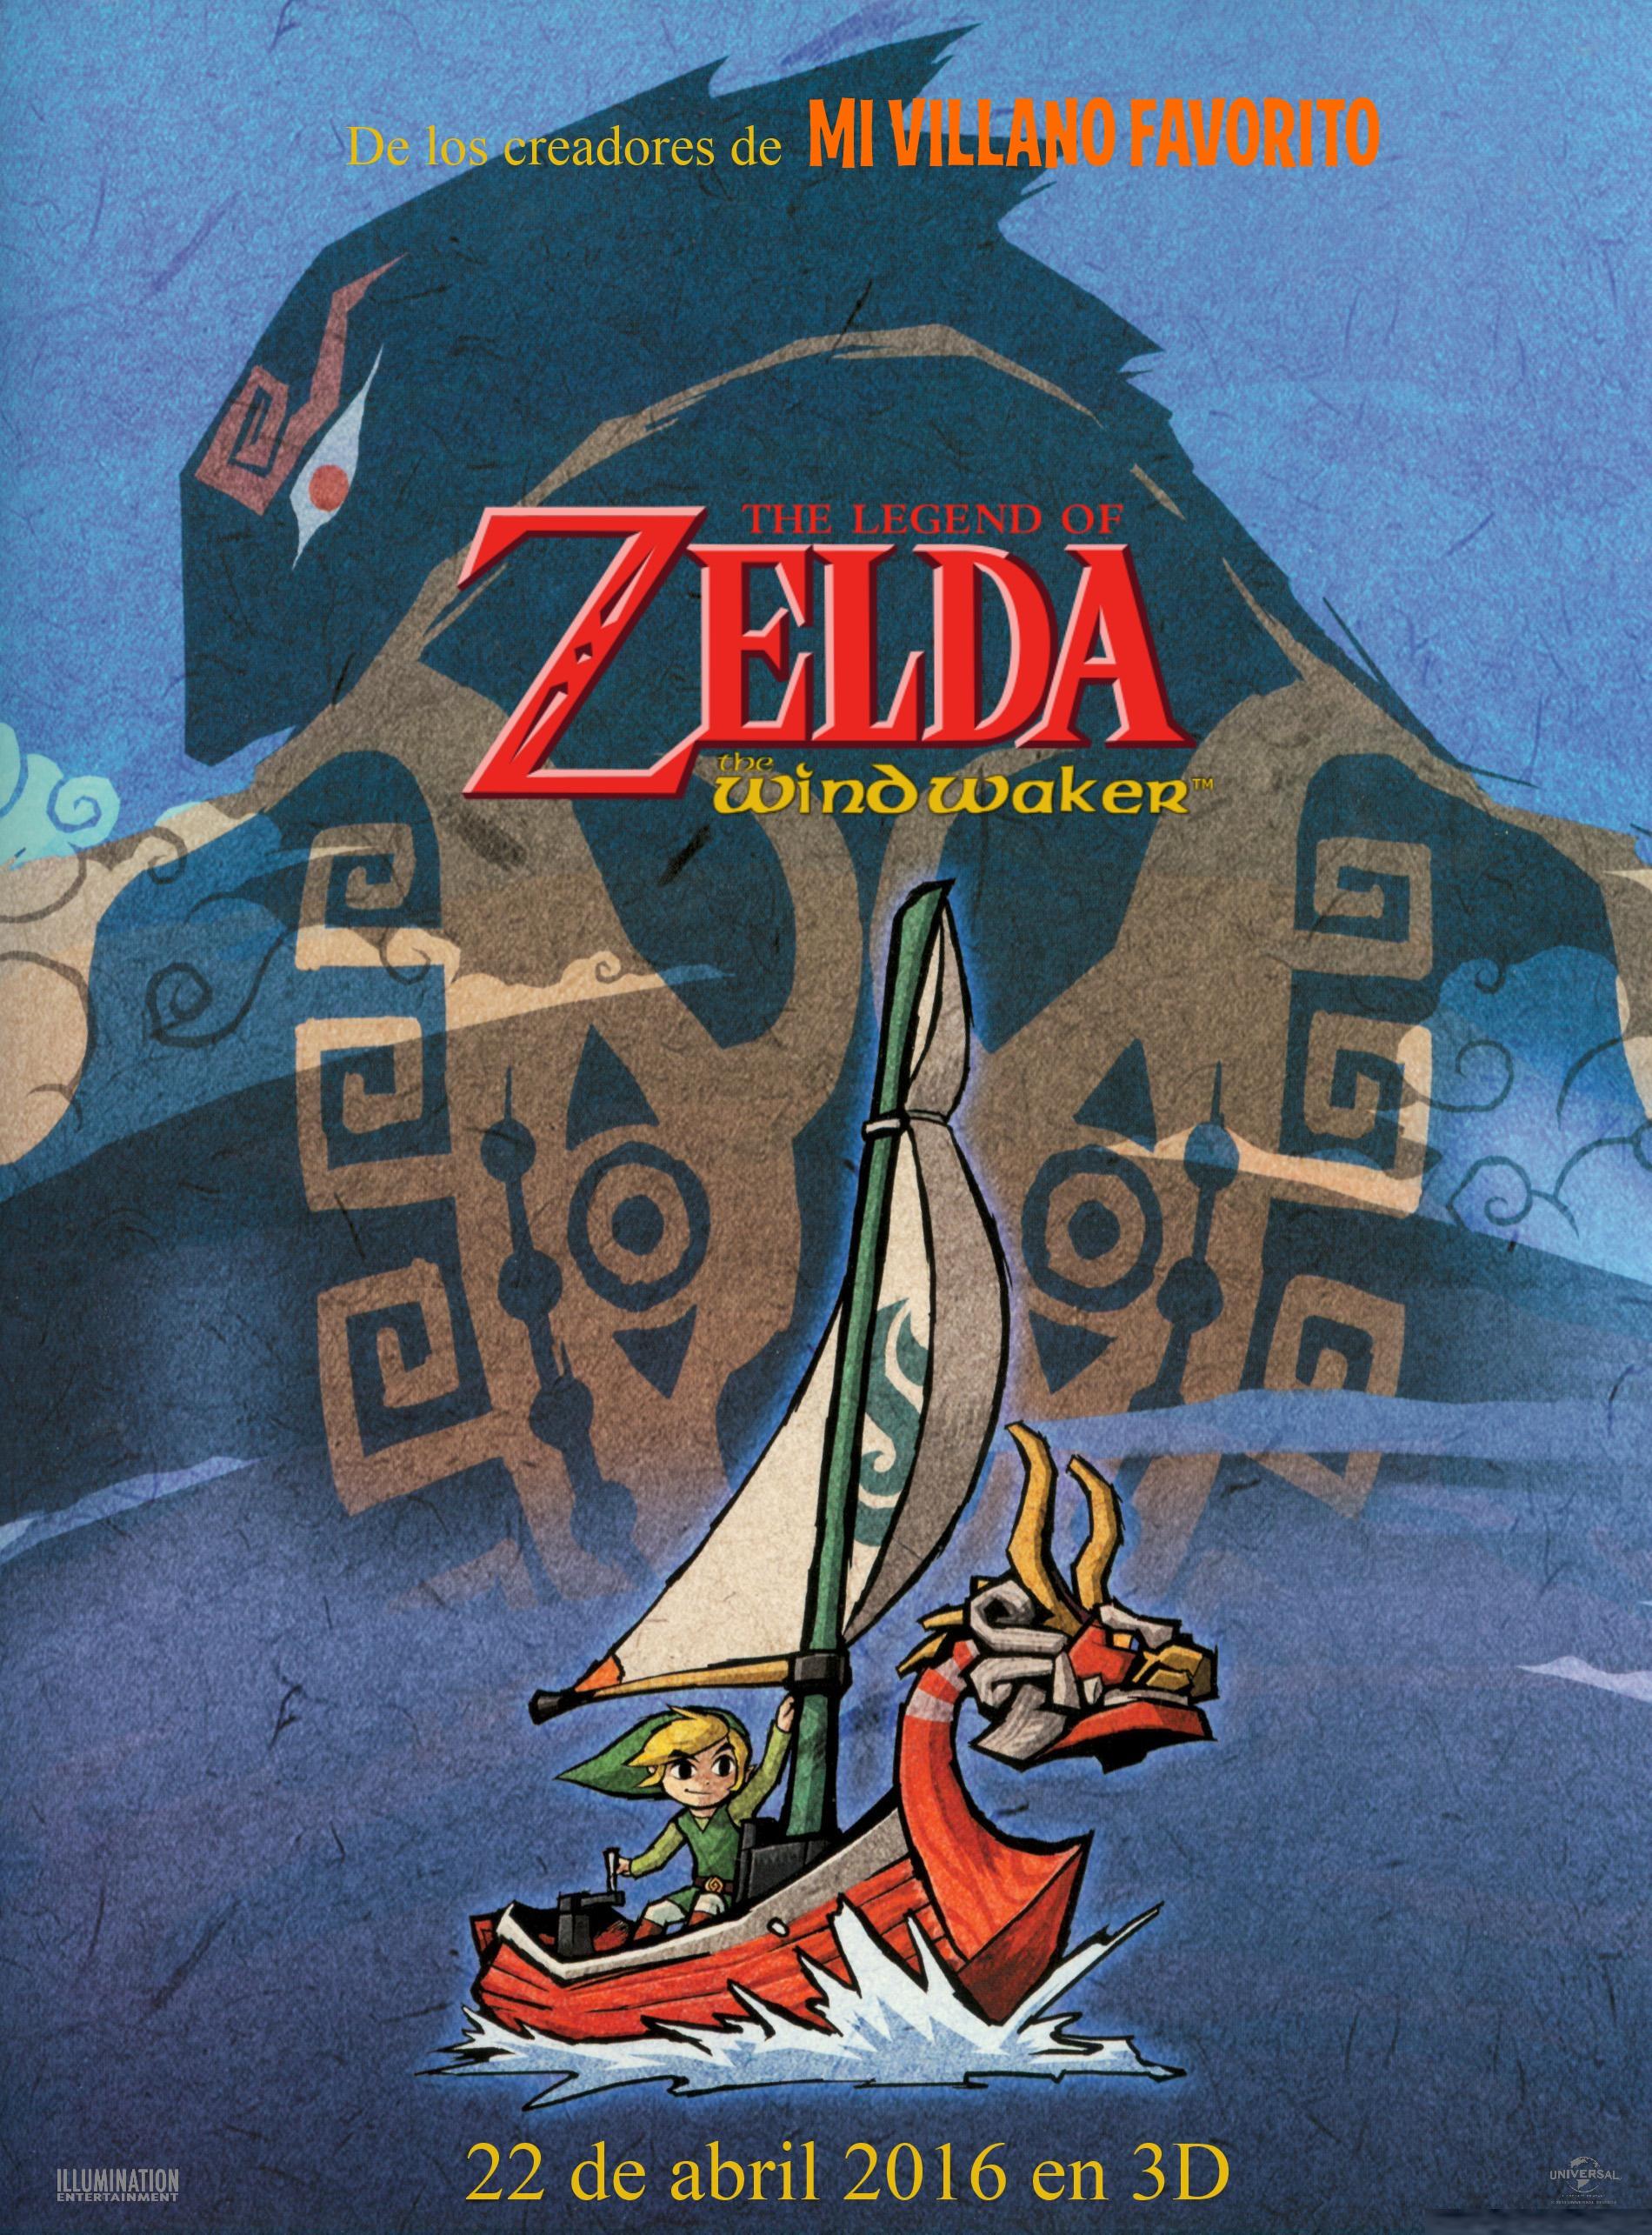 Legend Of Zelda Wind Waker Poster Image - The Wind Waker...